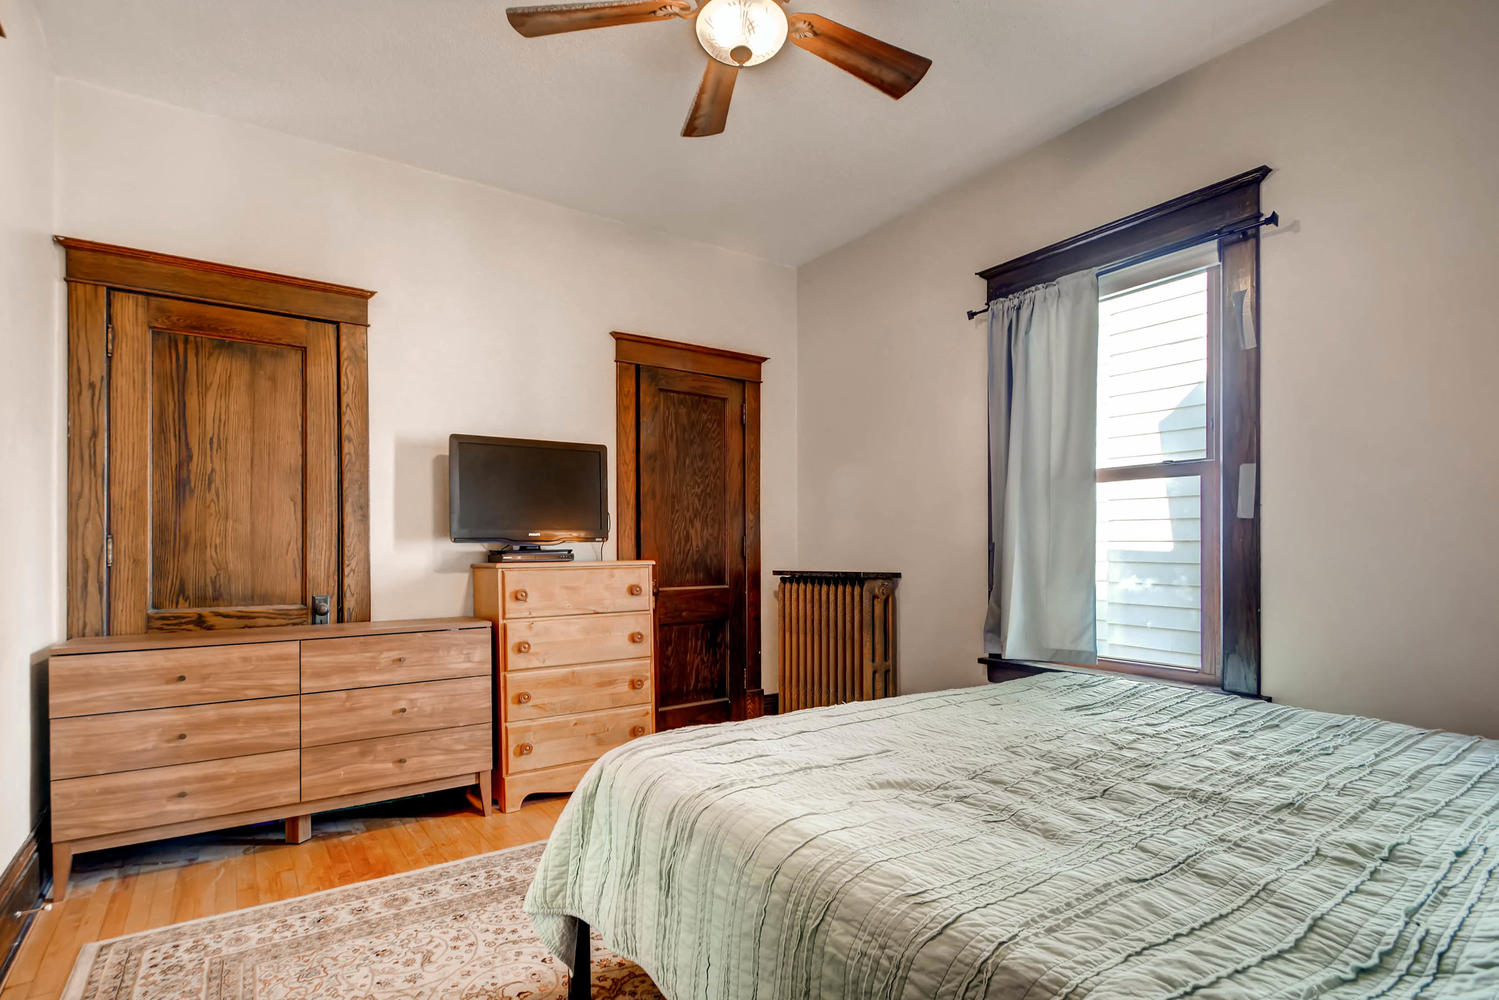 1121 Washington St NE-large-010-10-Bedroom-1500x1000-72dpi.jpg